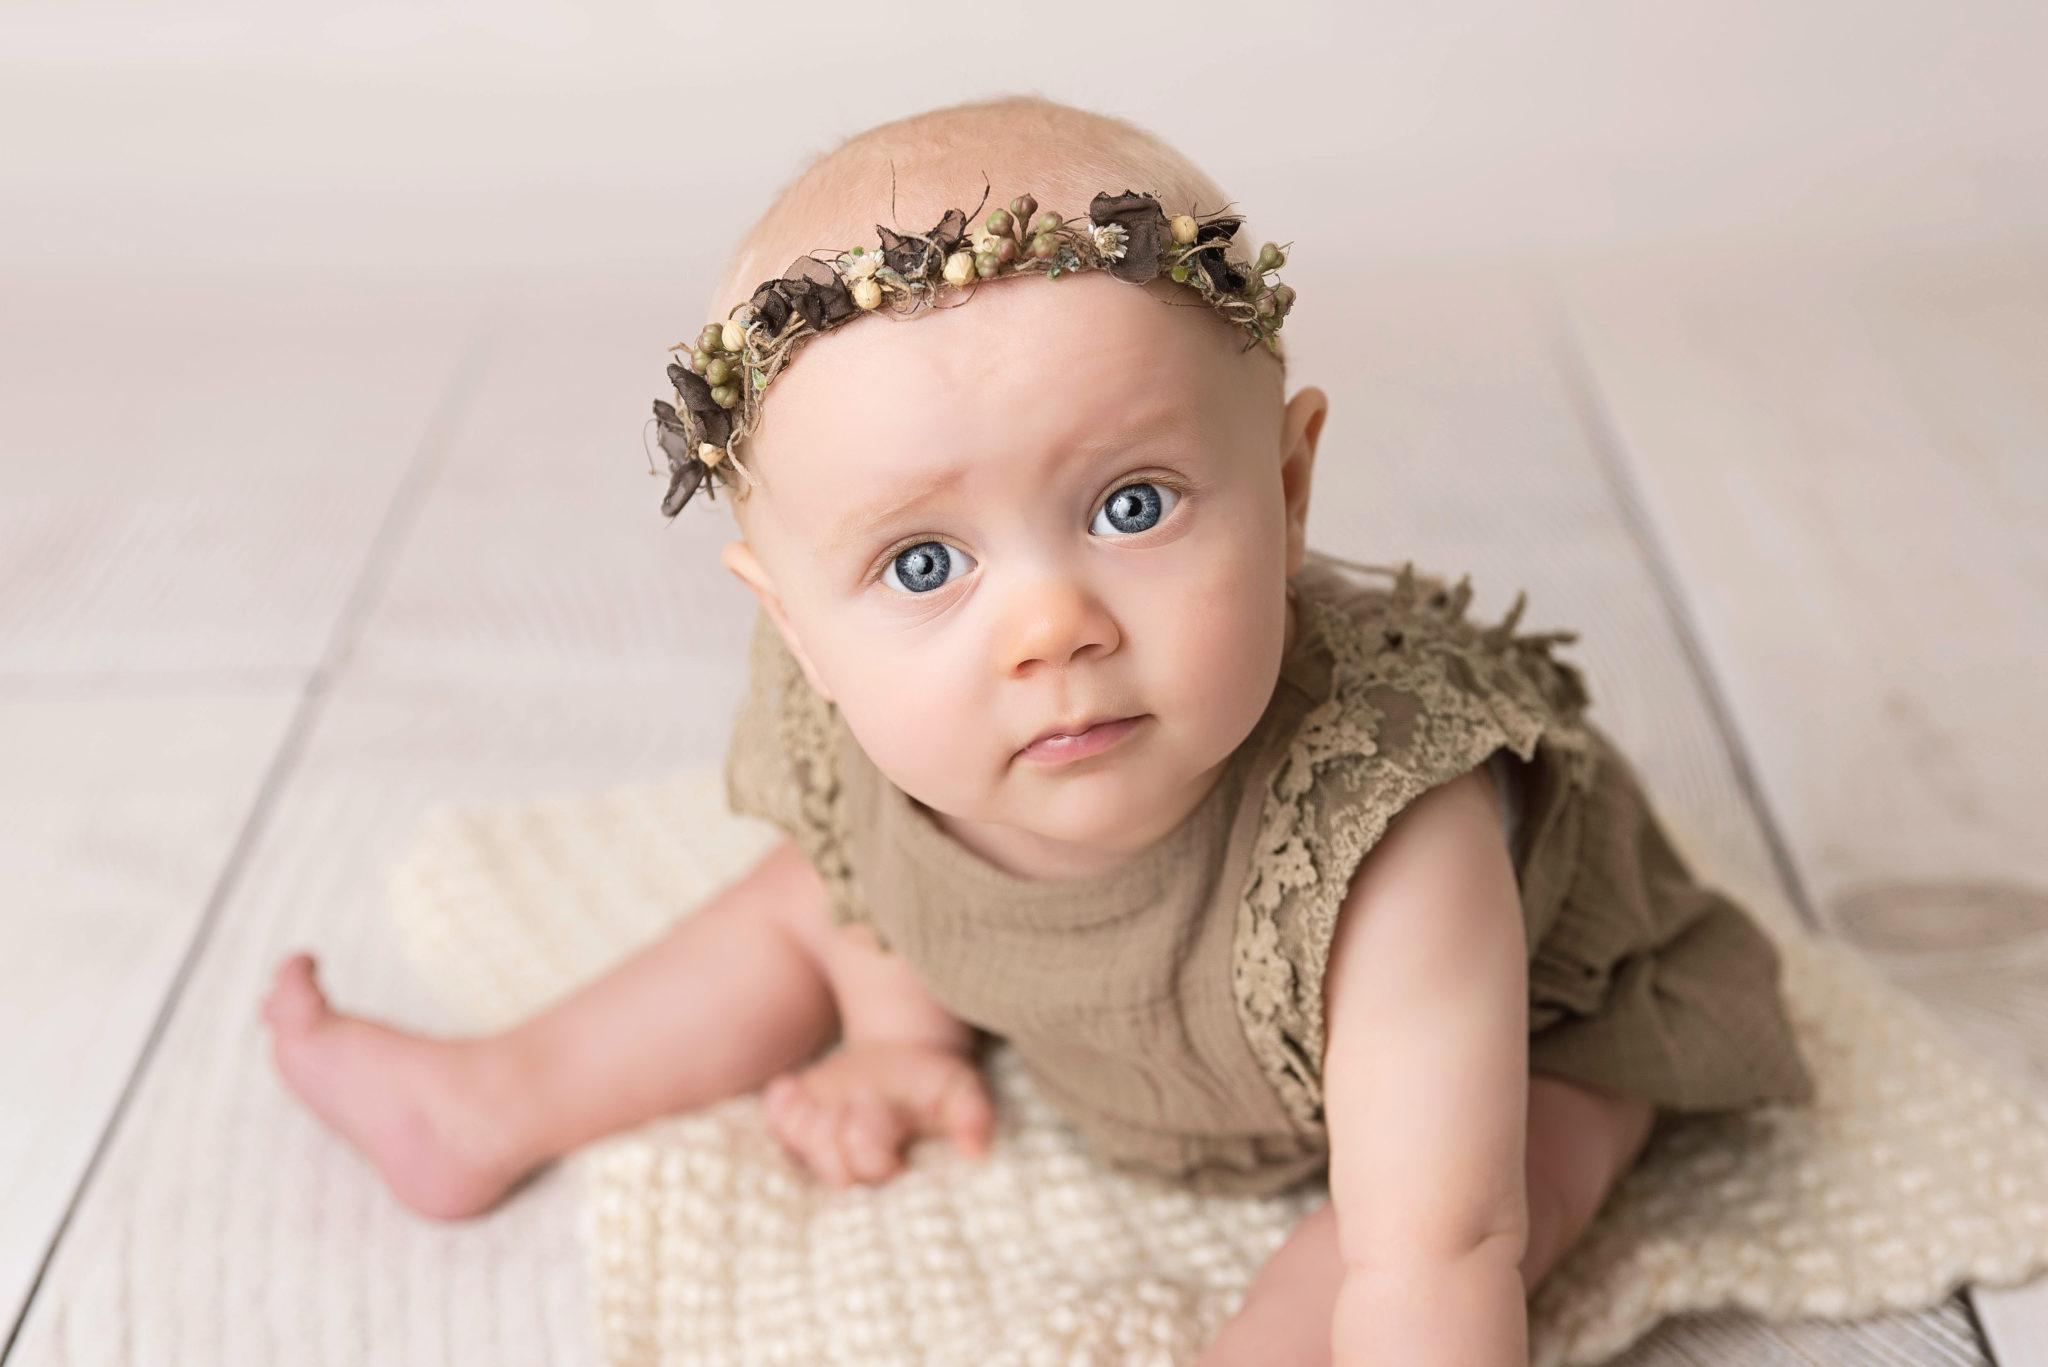 Photographe bébé oise seine et marne val d'oise ainse (9)